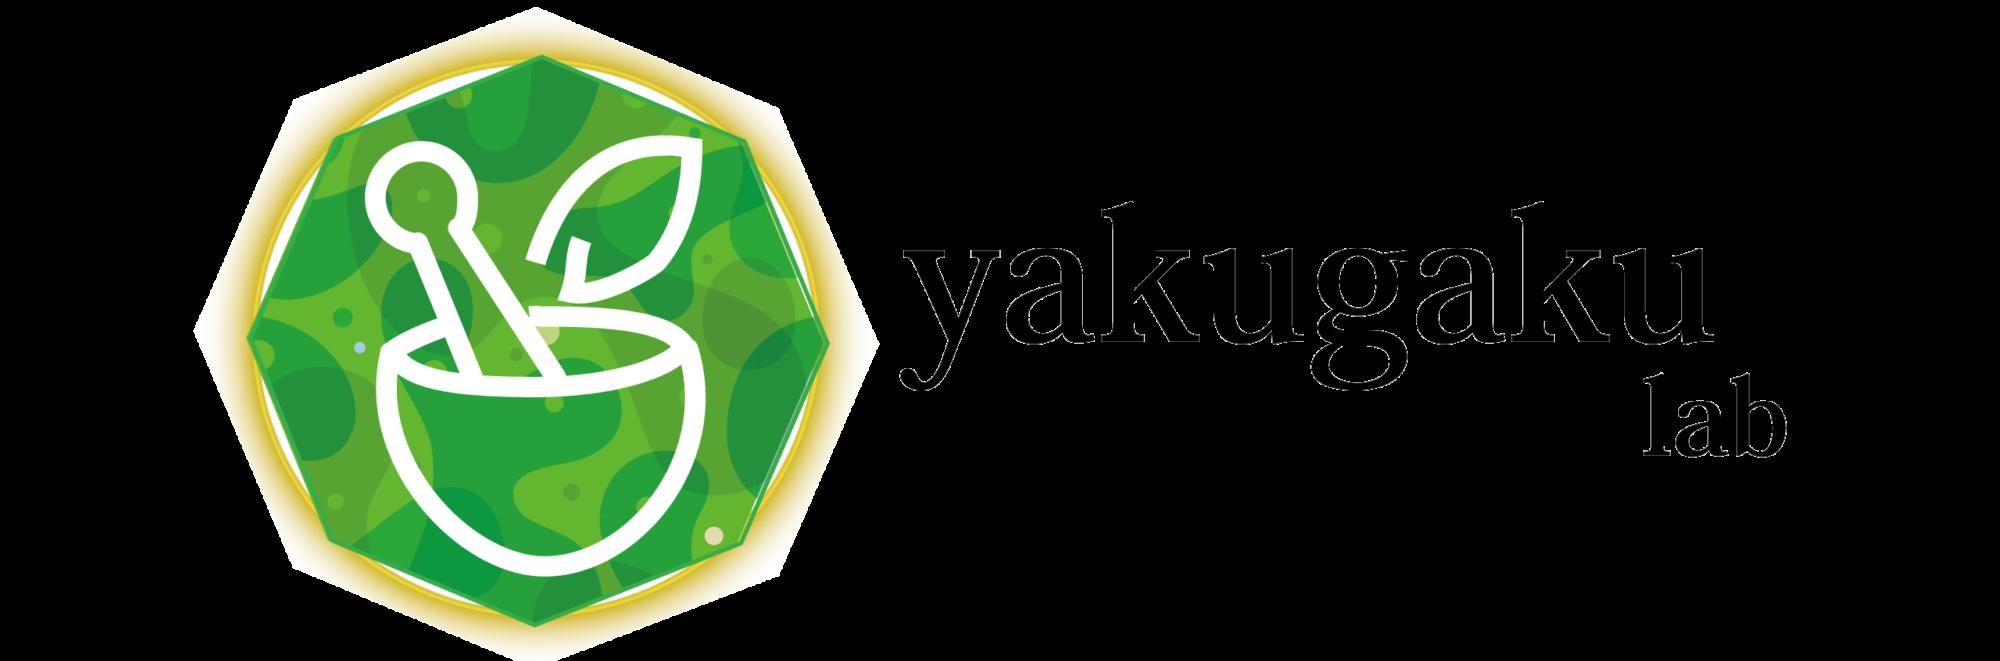 yakugaku lab(薬剤師国家試験対策、薬剤師国家試験解説)